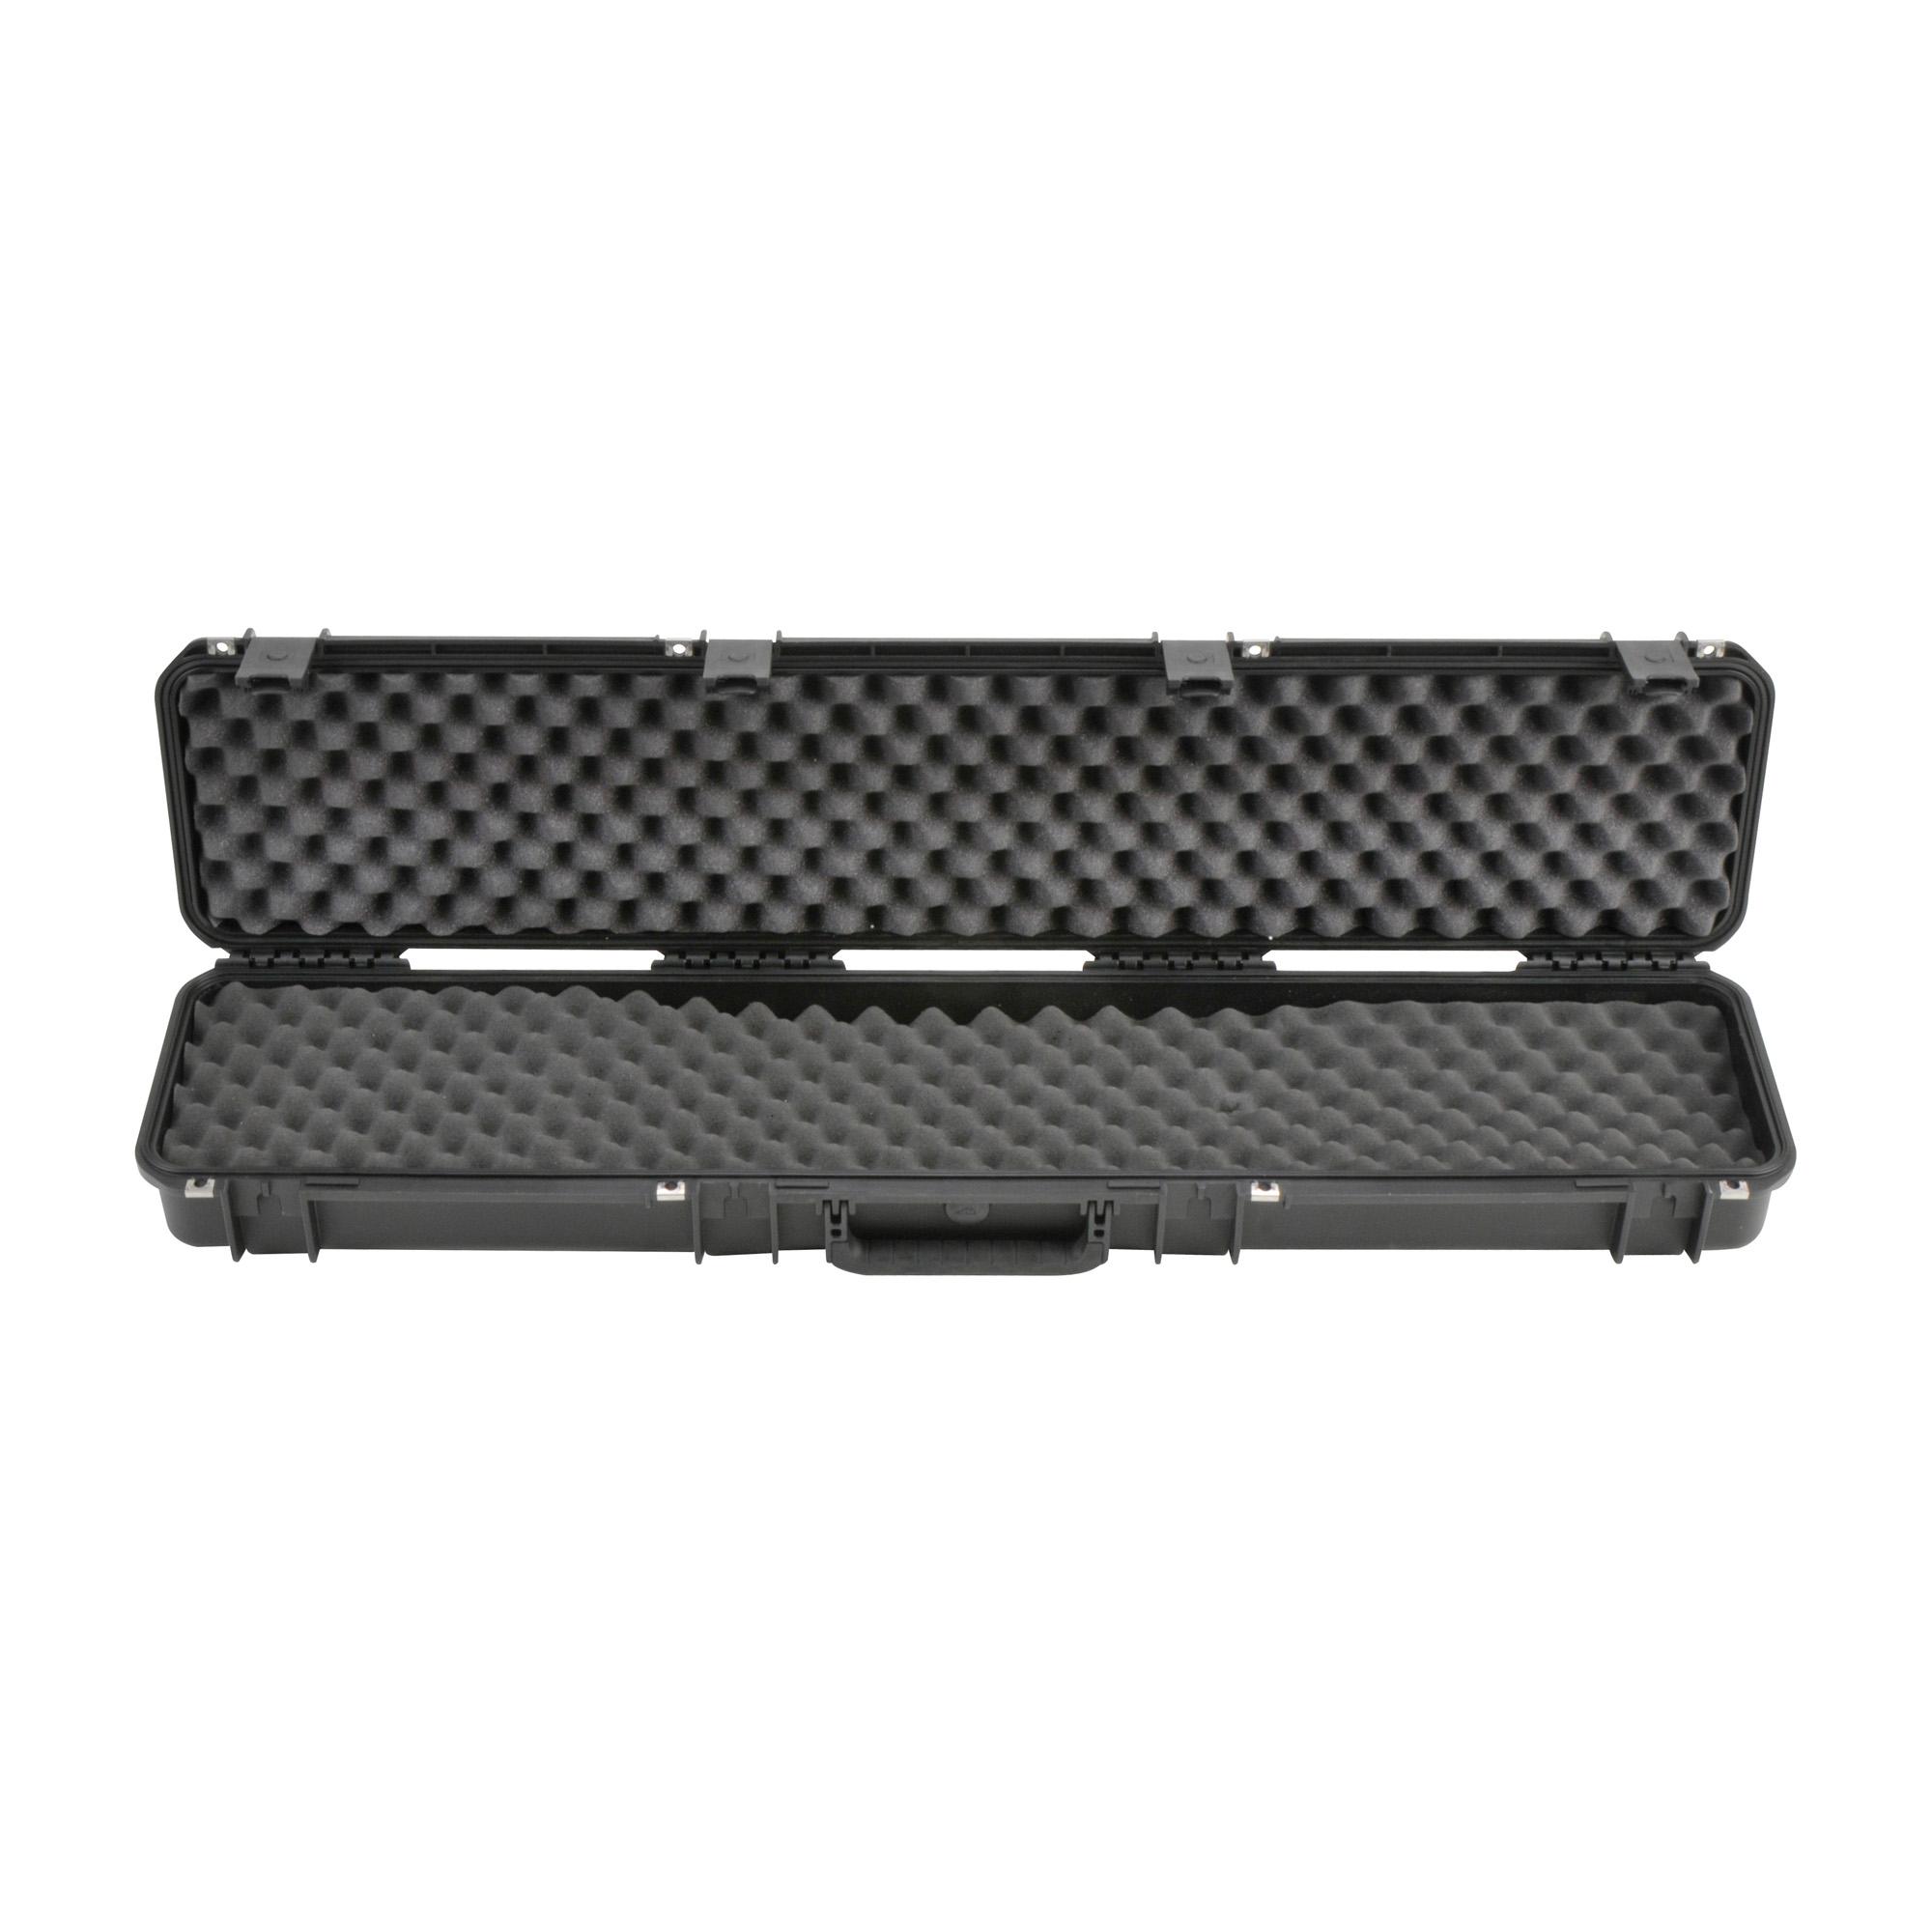 Skb I-series Single Rifle Case Blk